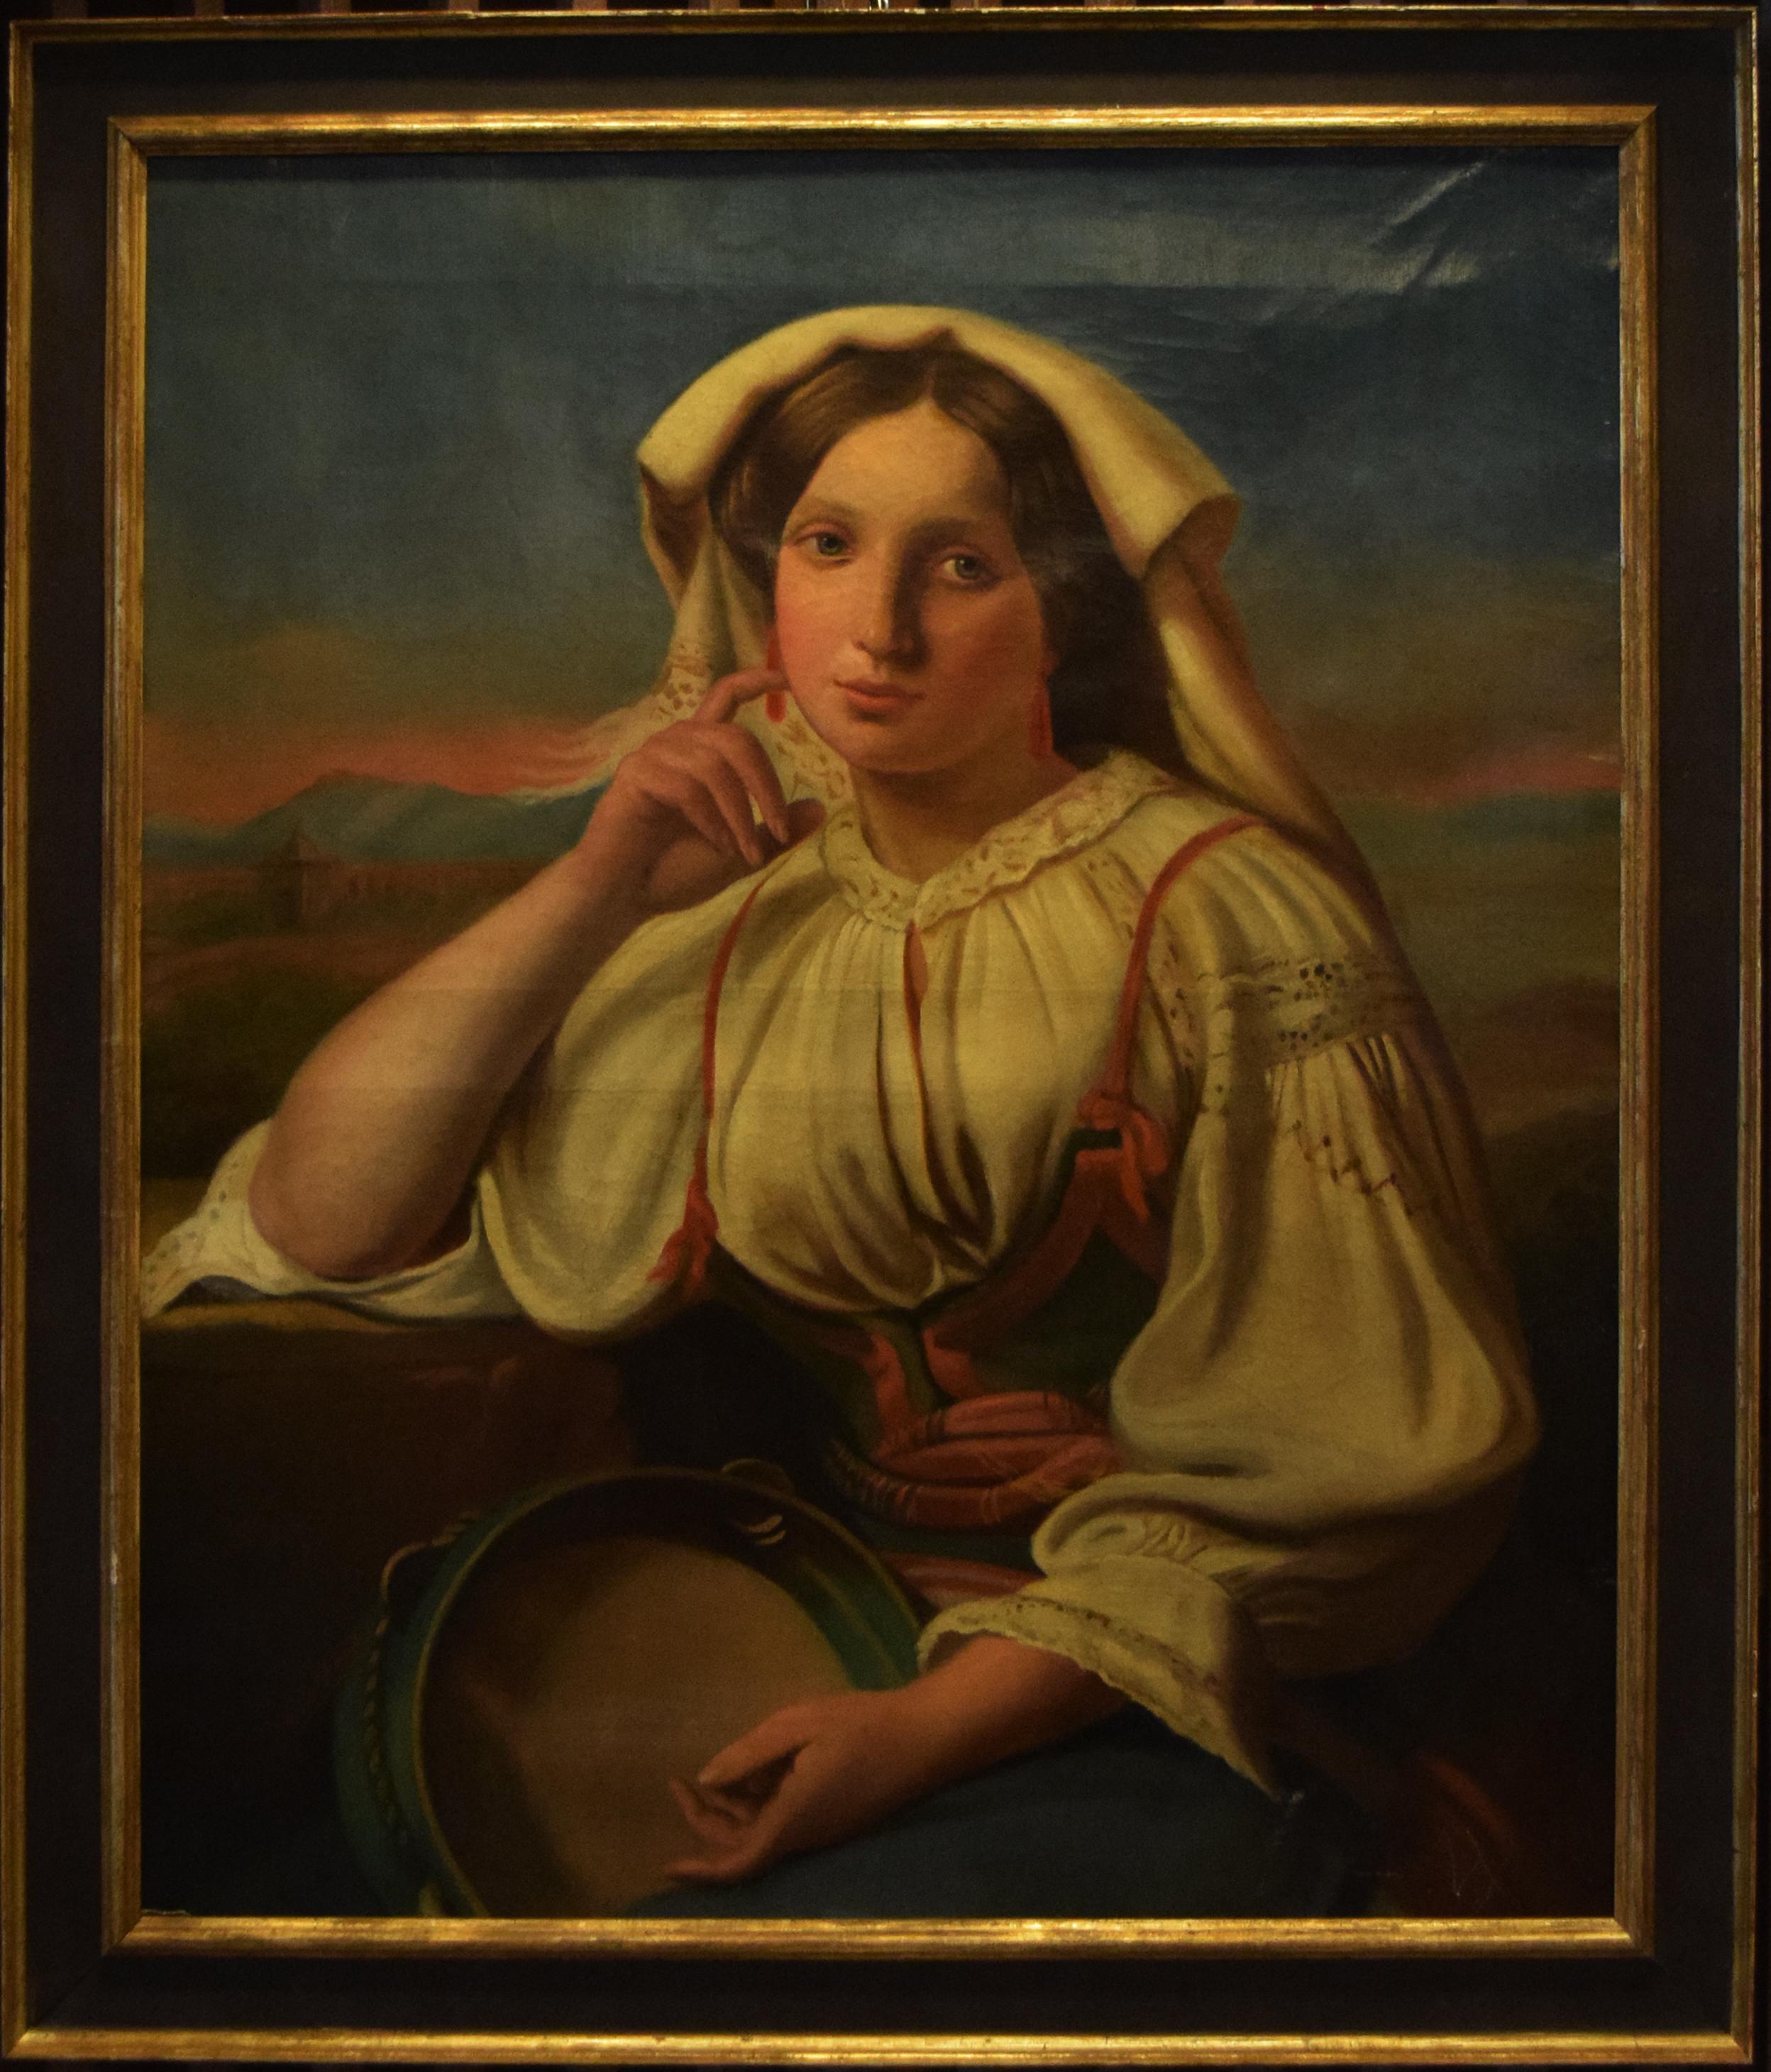 37-albert-robint-donna-romana-con-tamburello